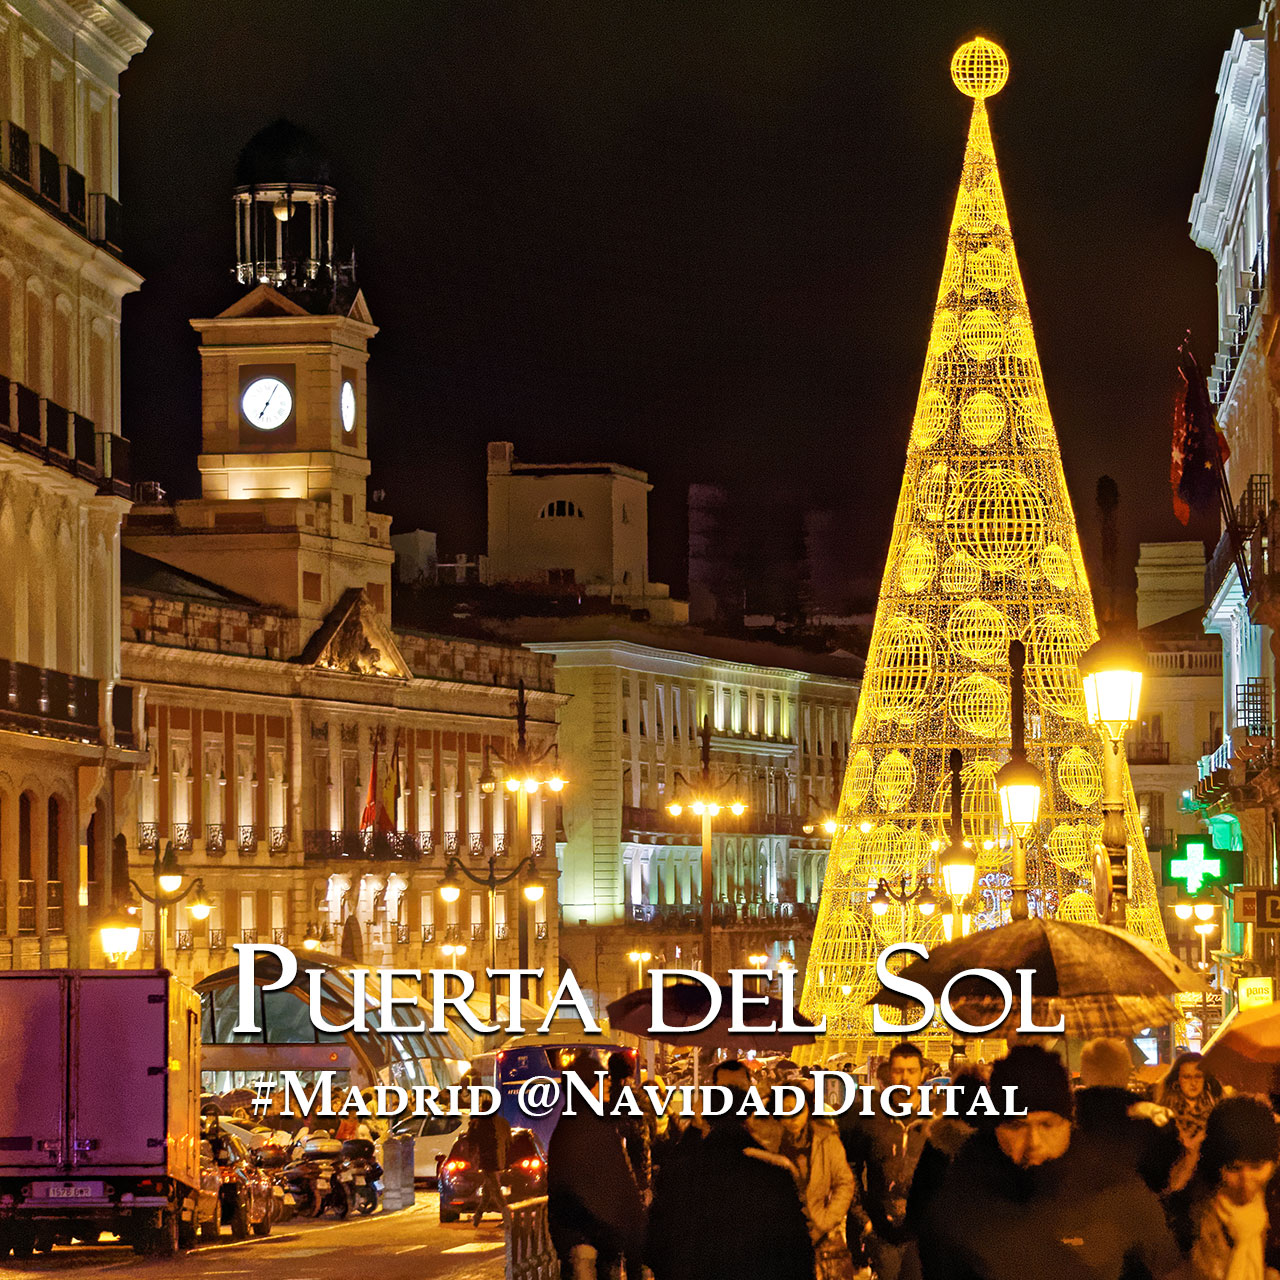 Puerta sol madrid navidad 2014 2 el blog de navidad digital for El sol madrid